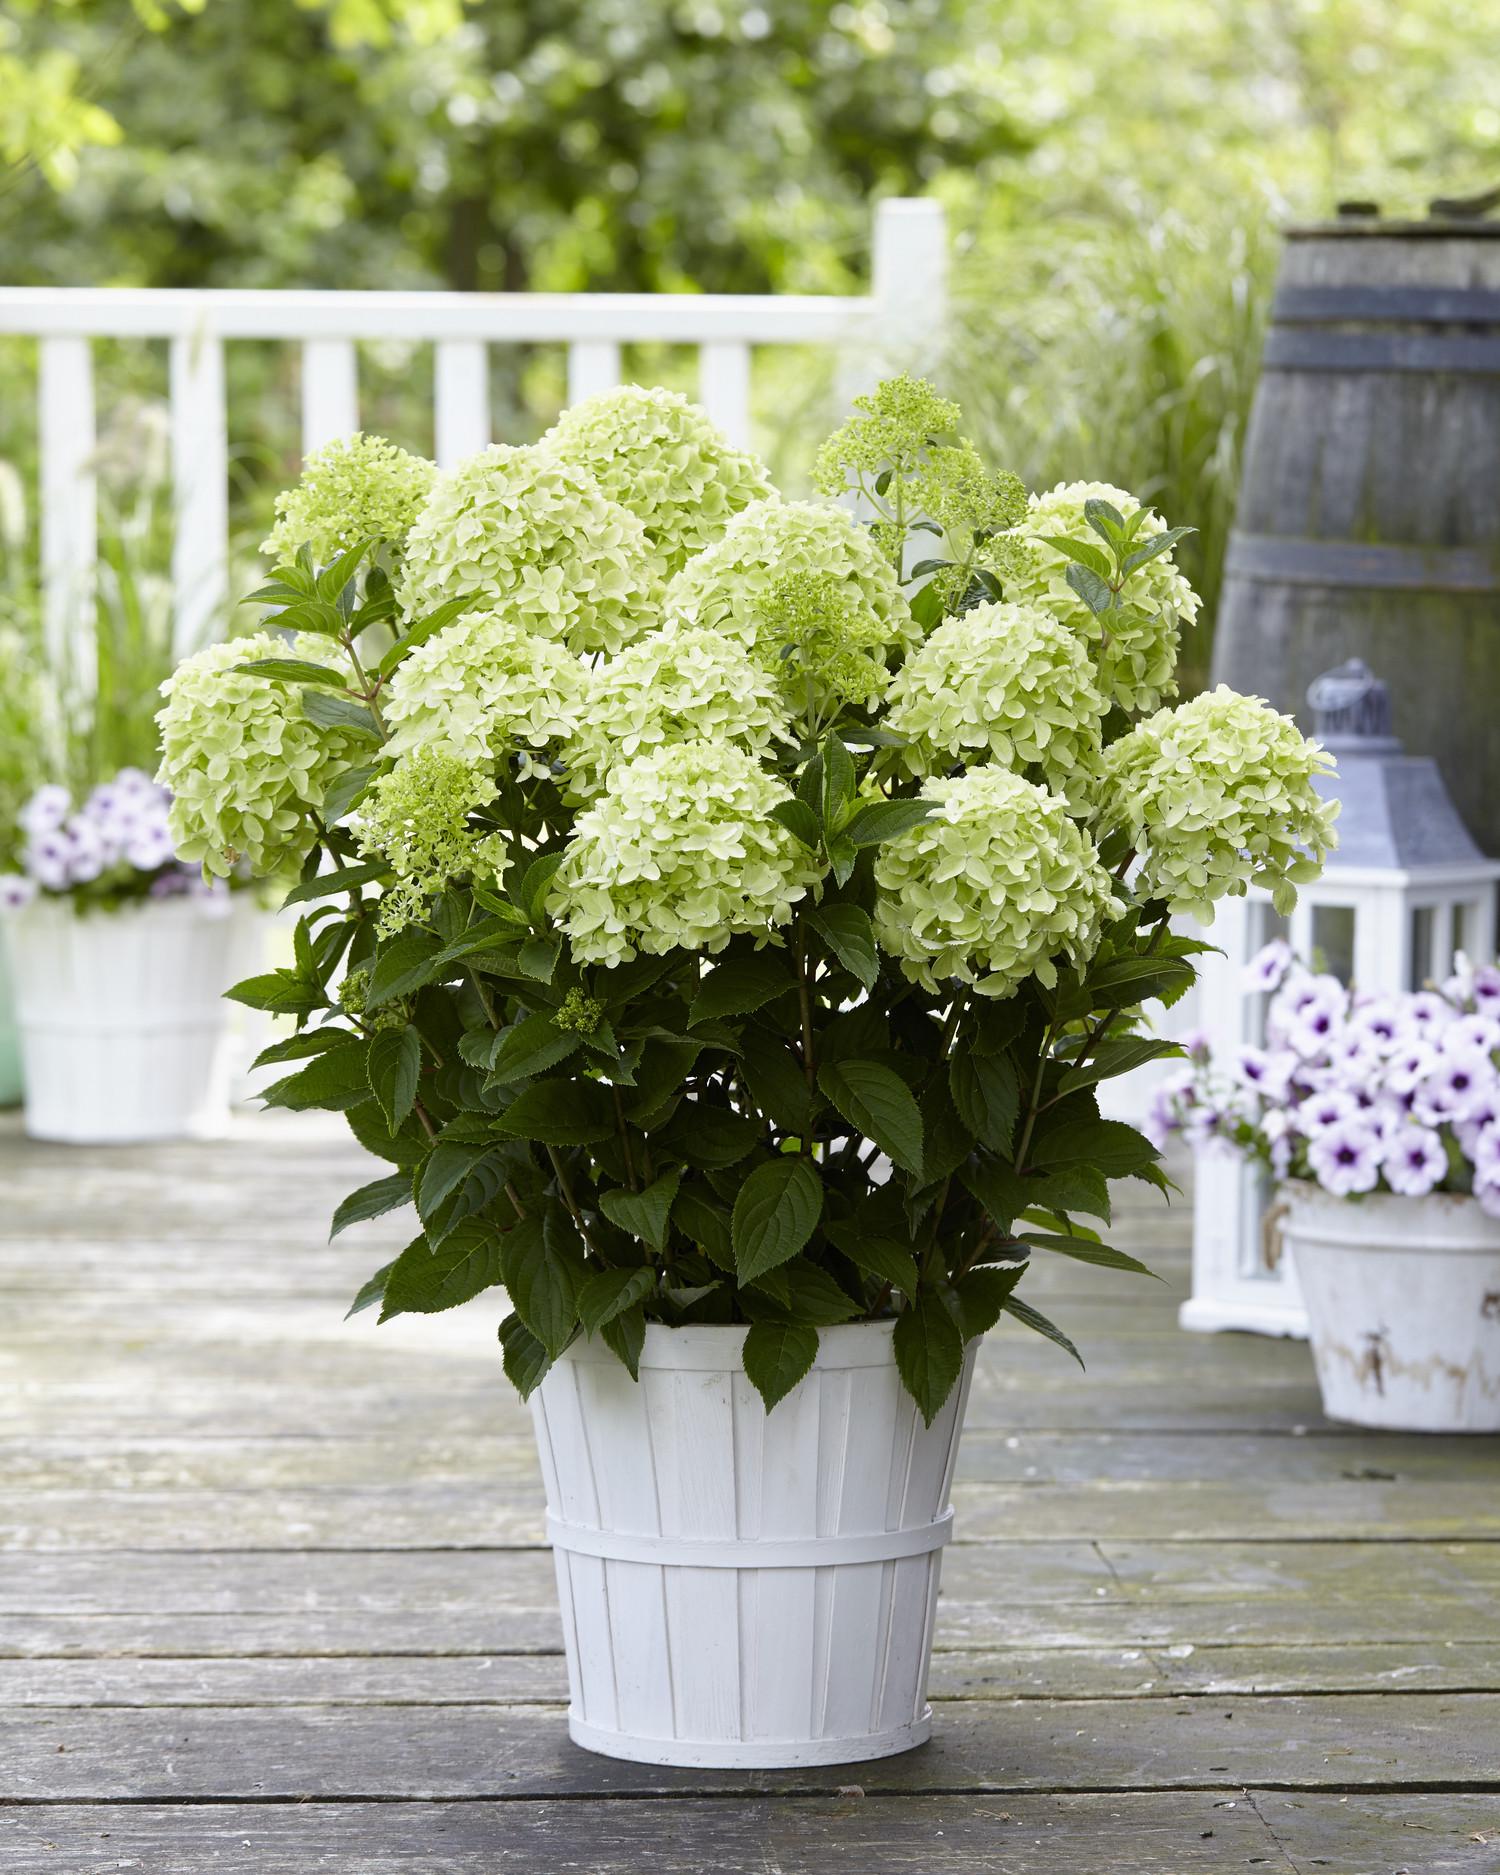 Hydrangea paniculata 'HYLV02' (Whitelight)